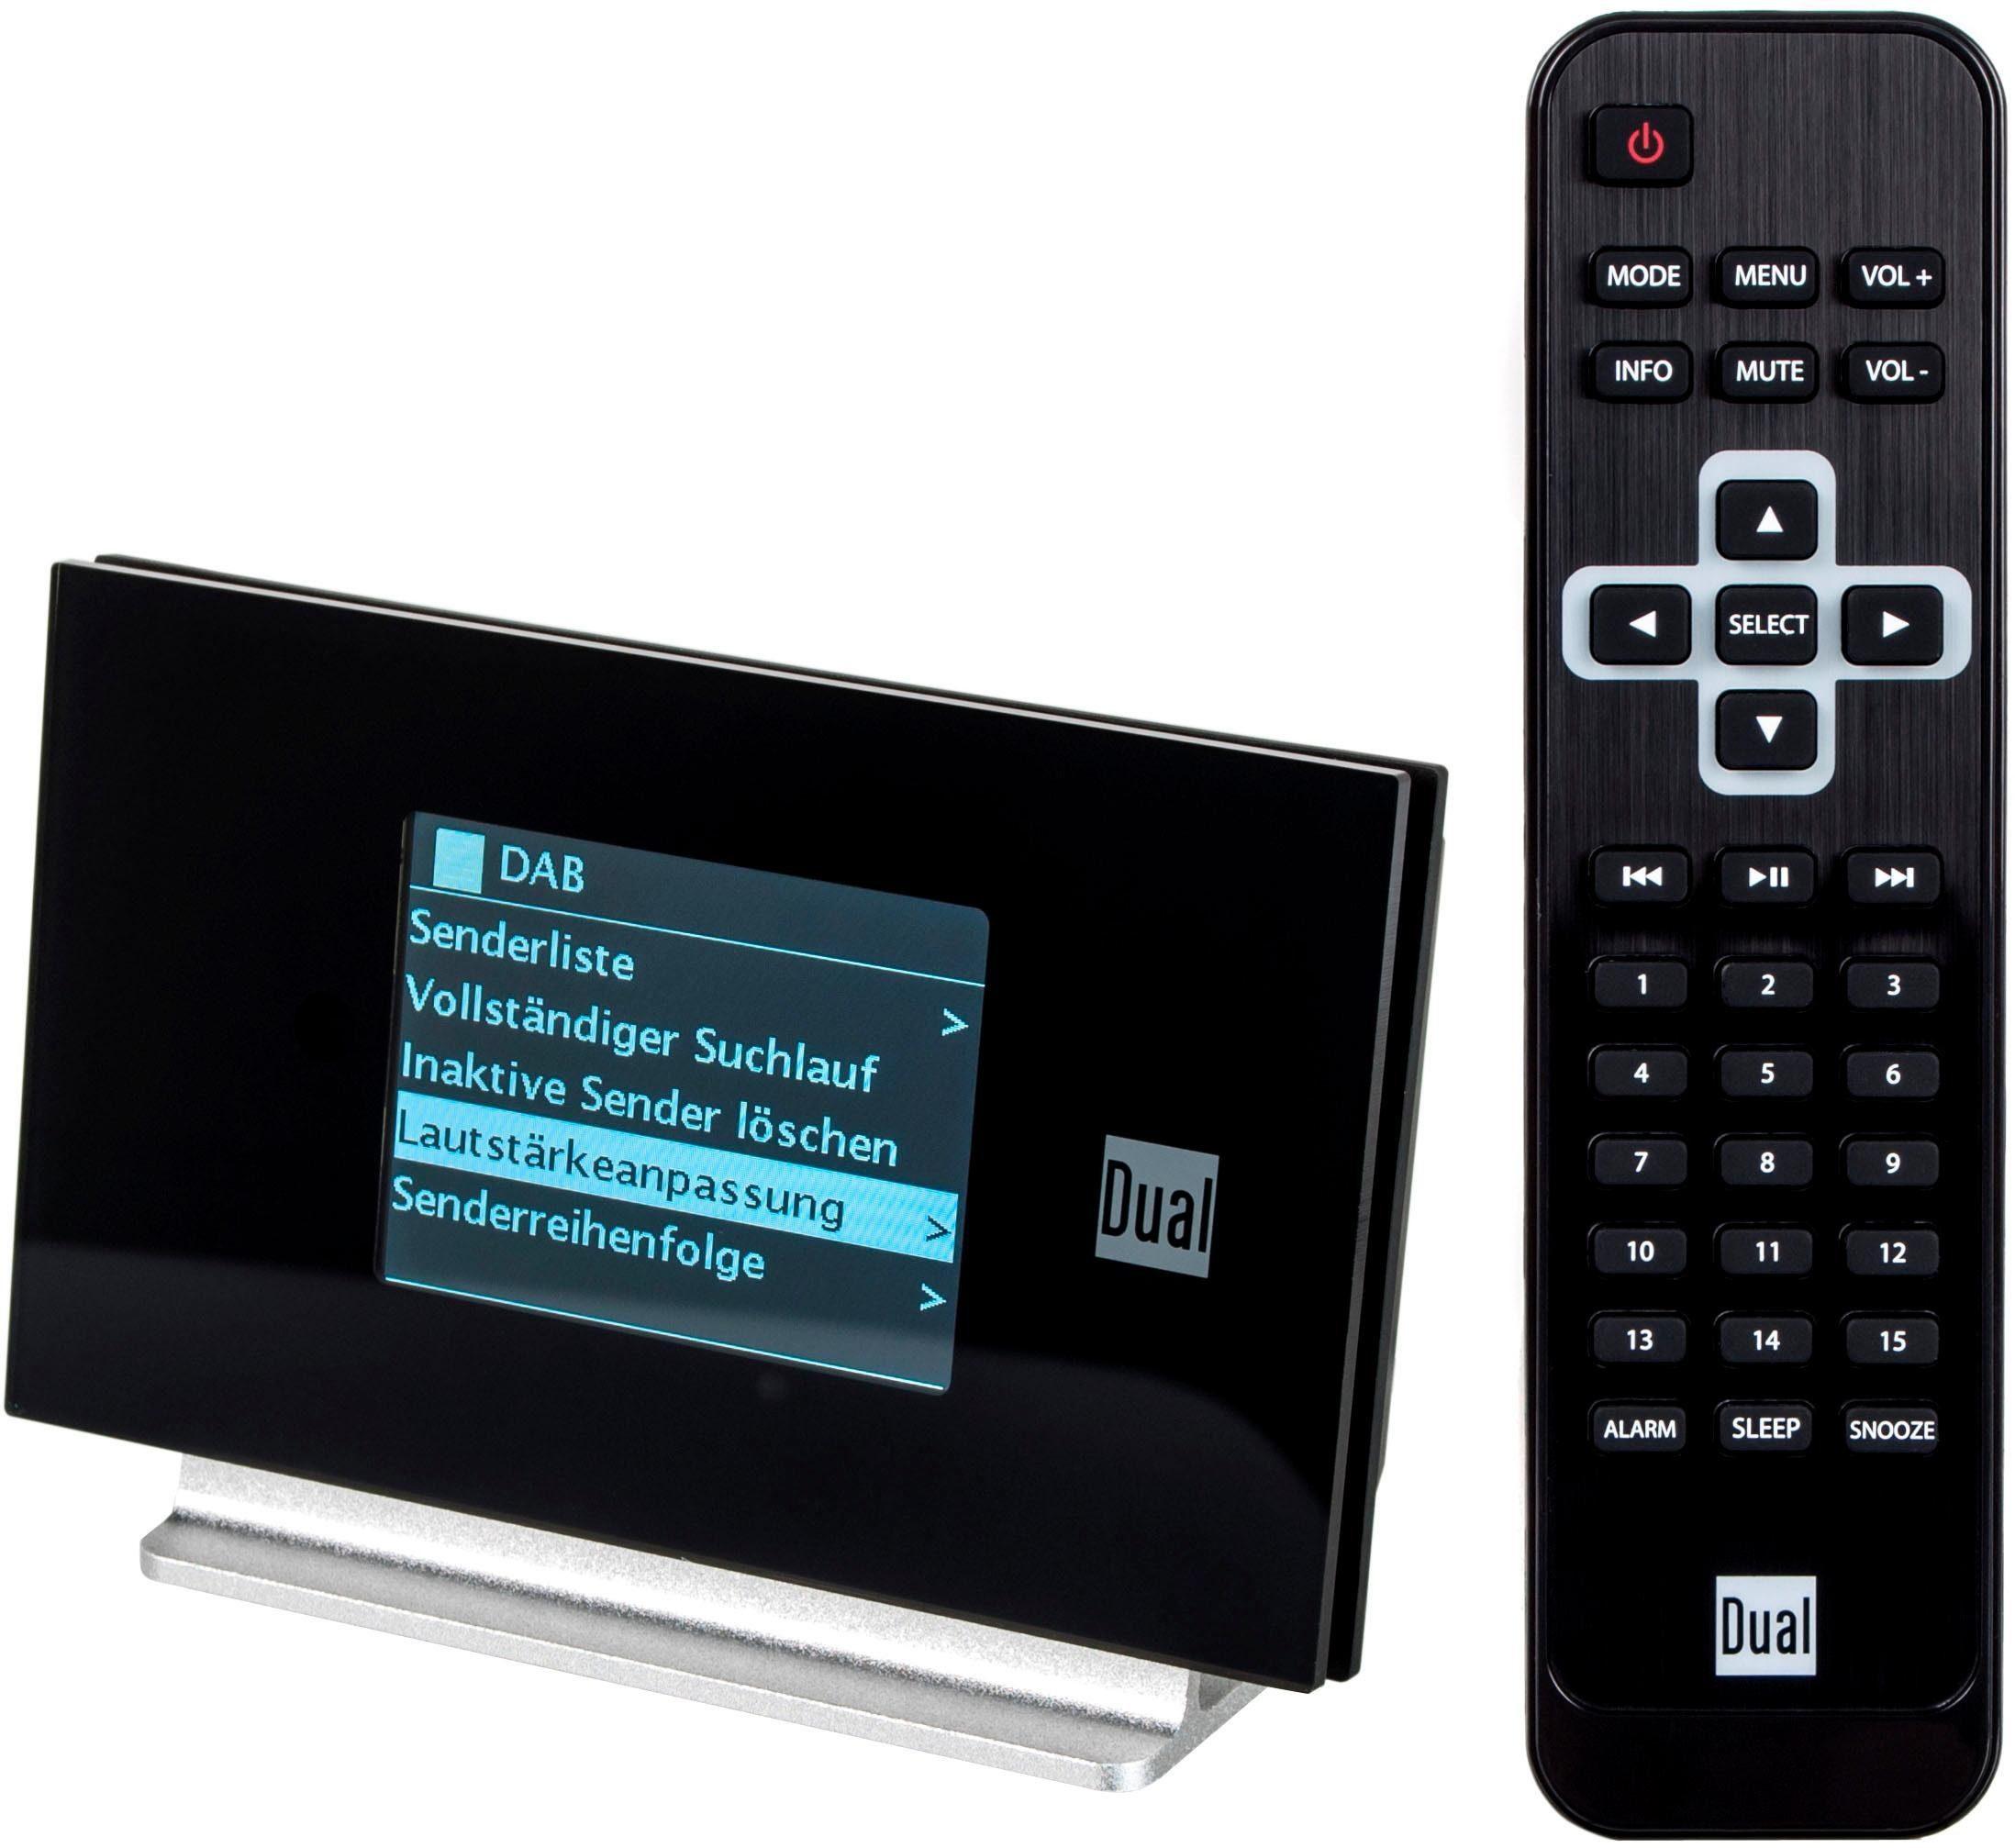 Dual »Dual Radiostation IR 3A« Audio-Adapter F-Stecker zu 3,5-mm-Klinke, AV OUT/Digital